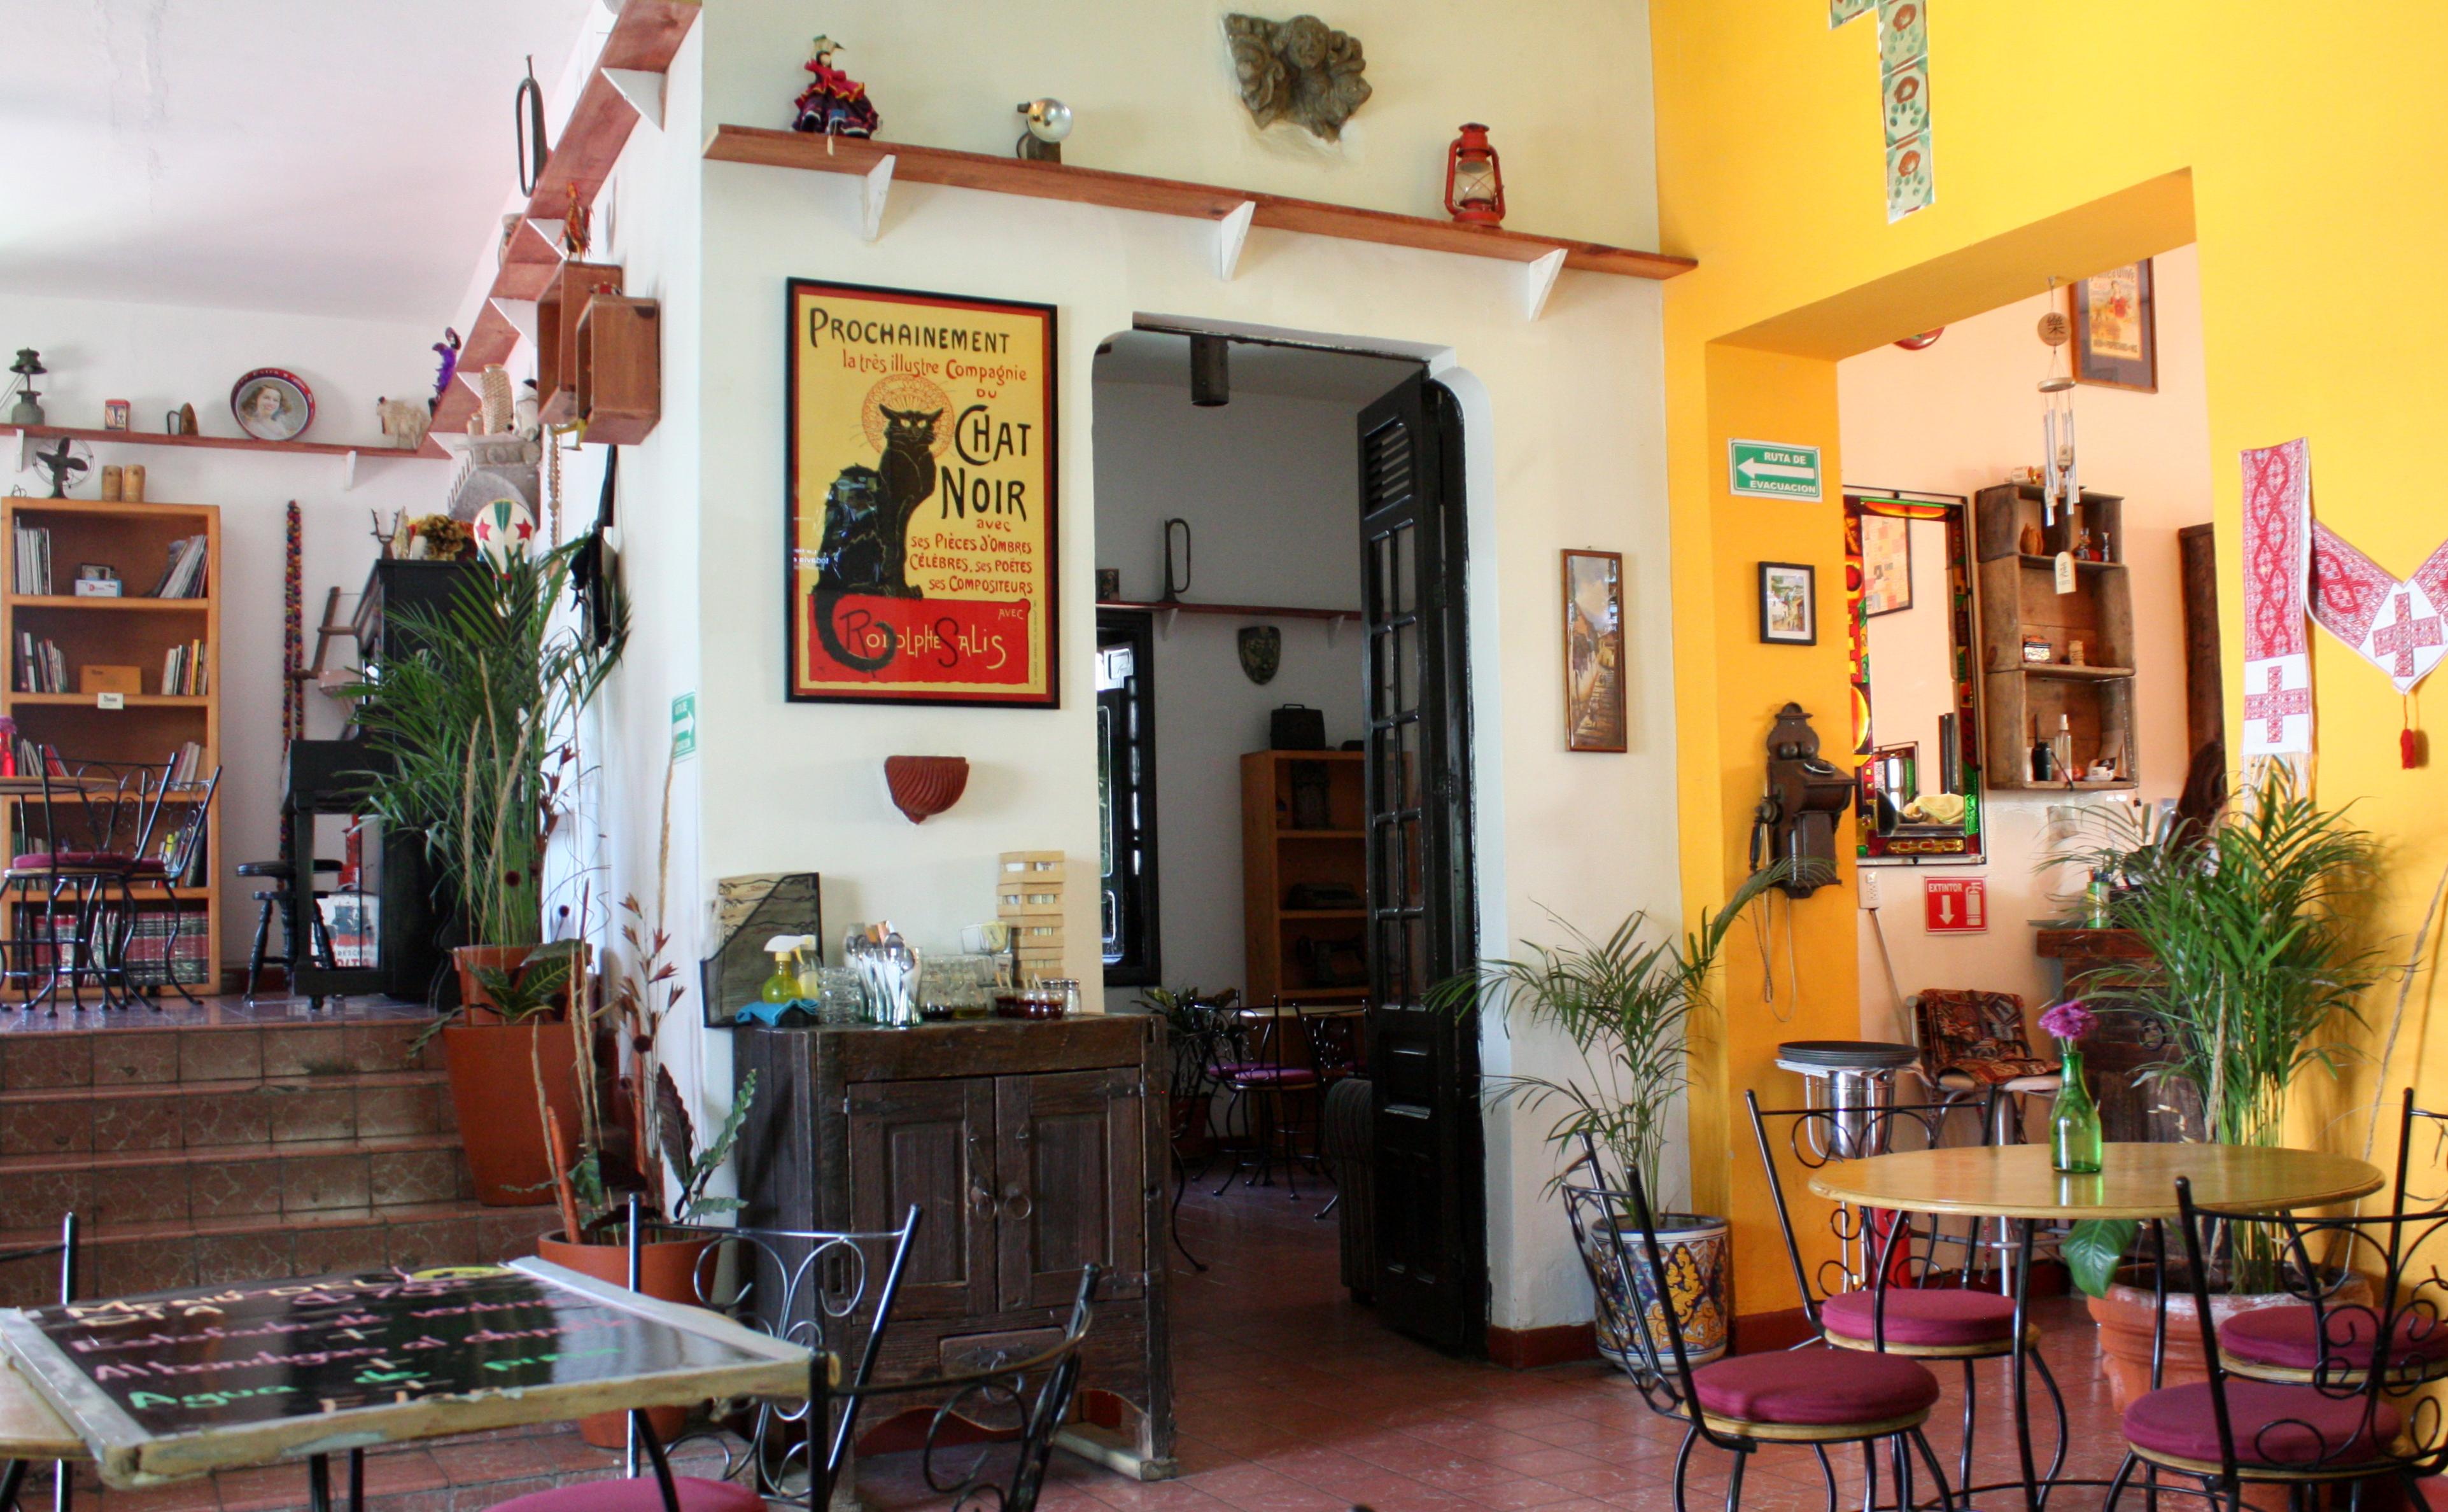 Primer Piso Jazz Club Guadalajara  Antonio Rambls travels